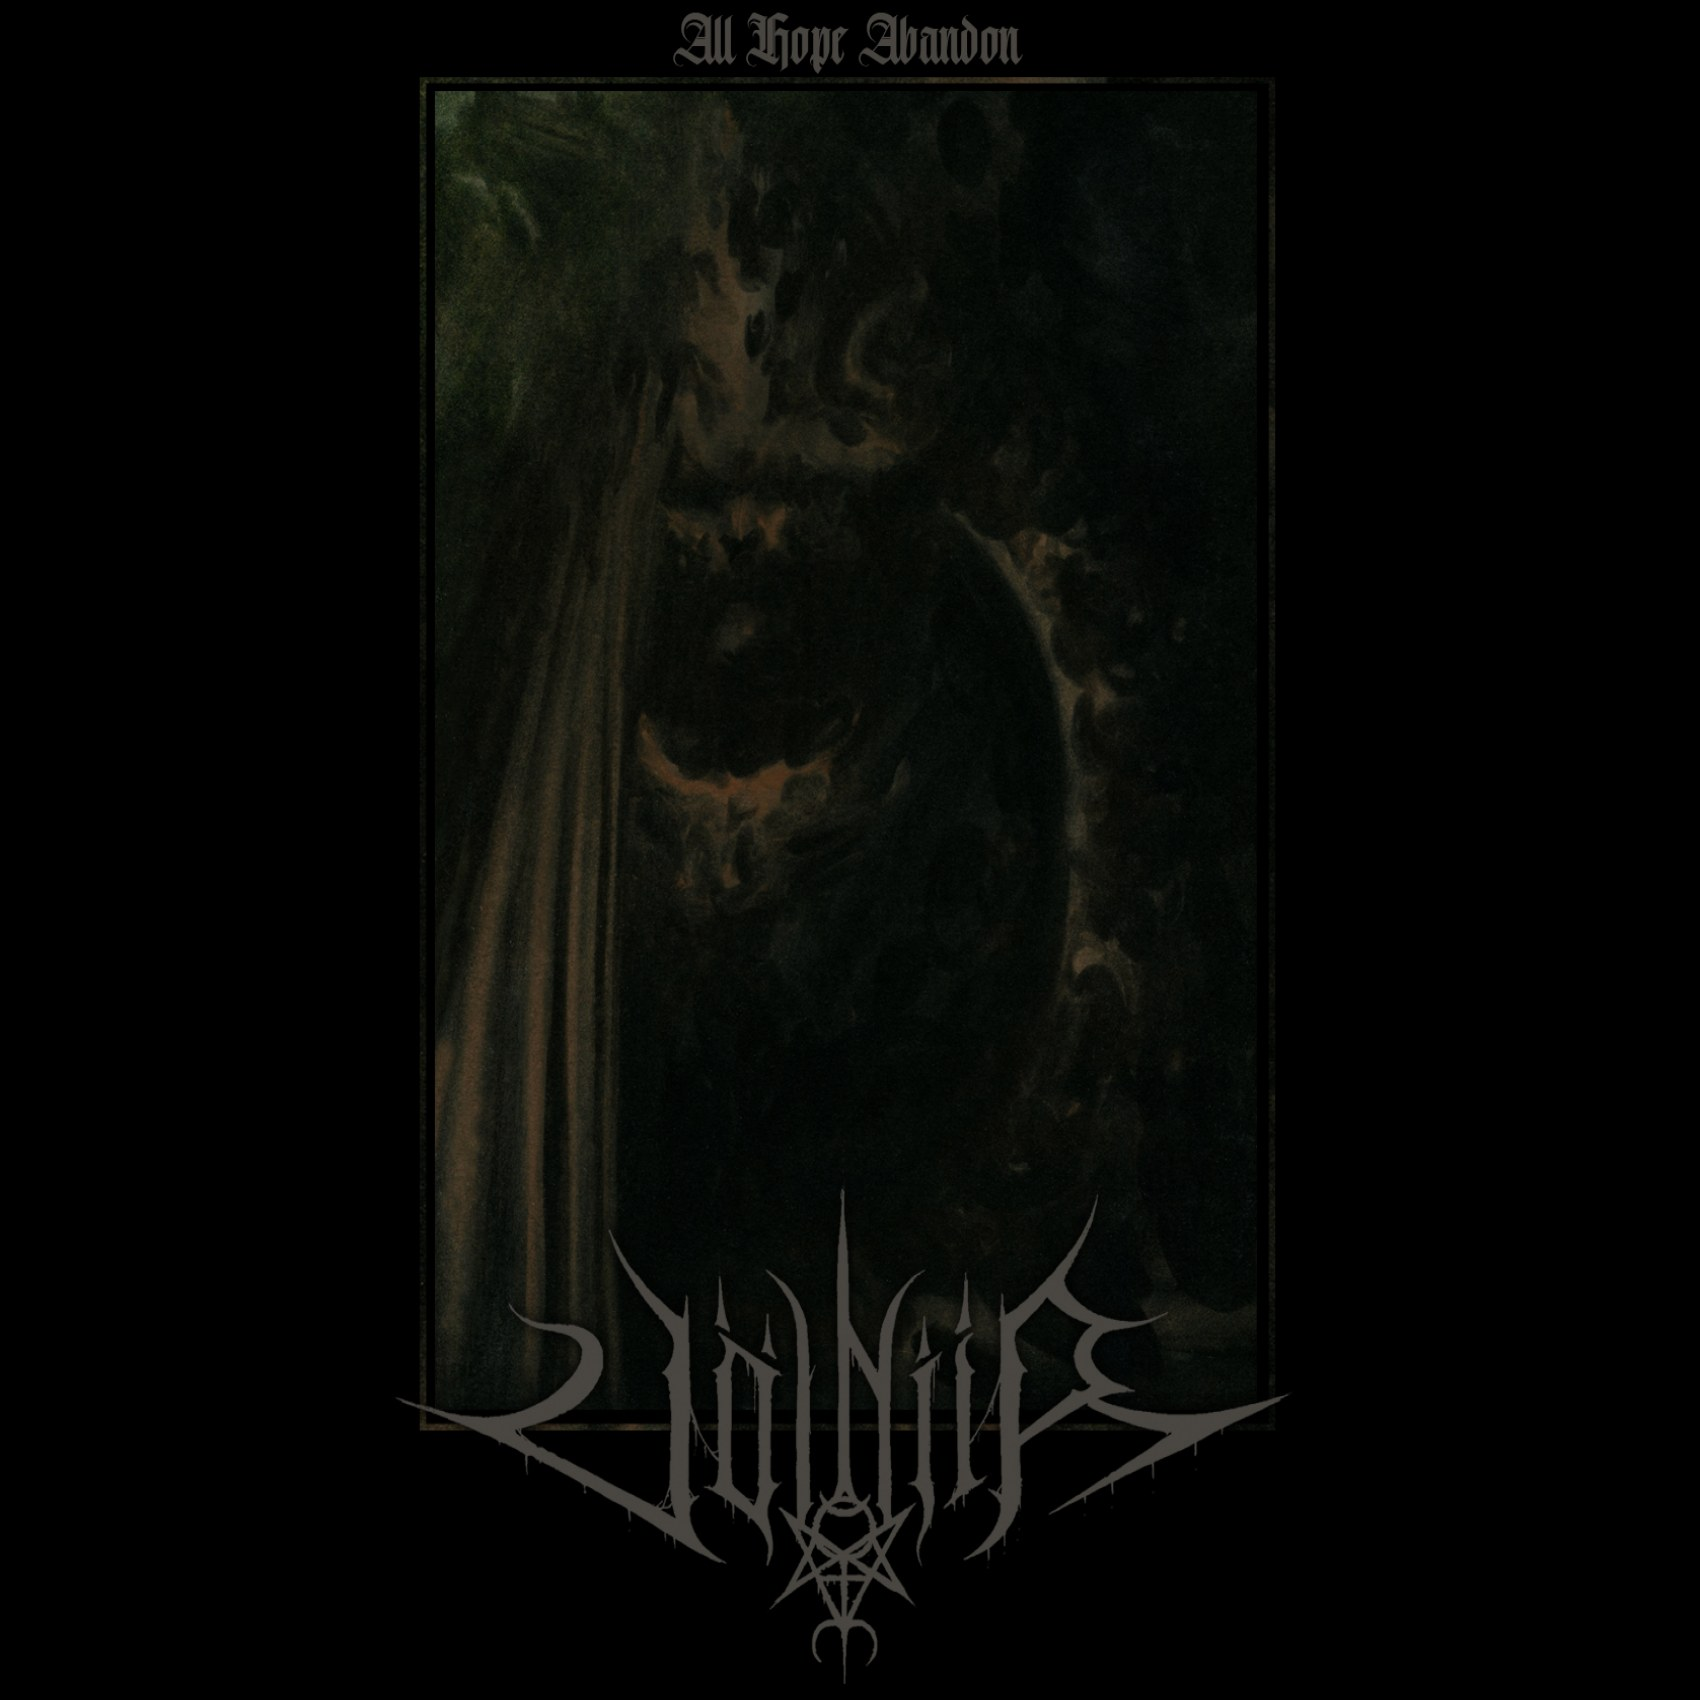 Völniir - All Hope Abandon